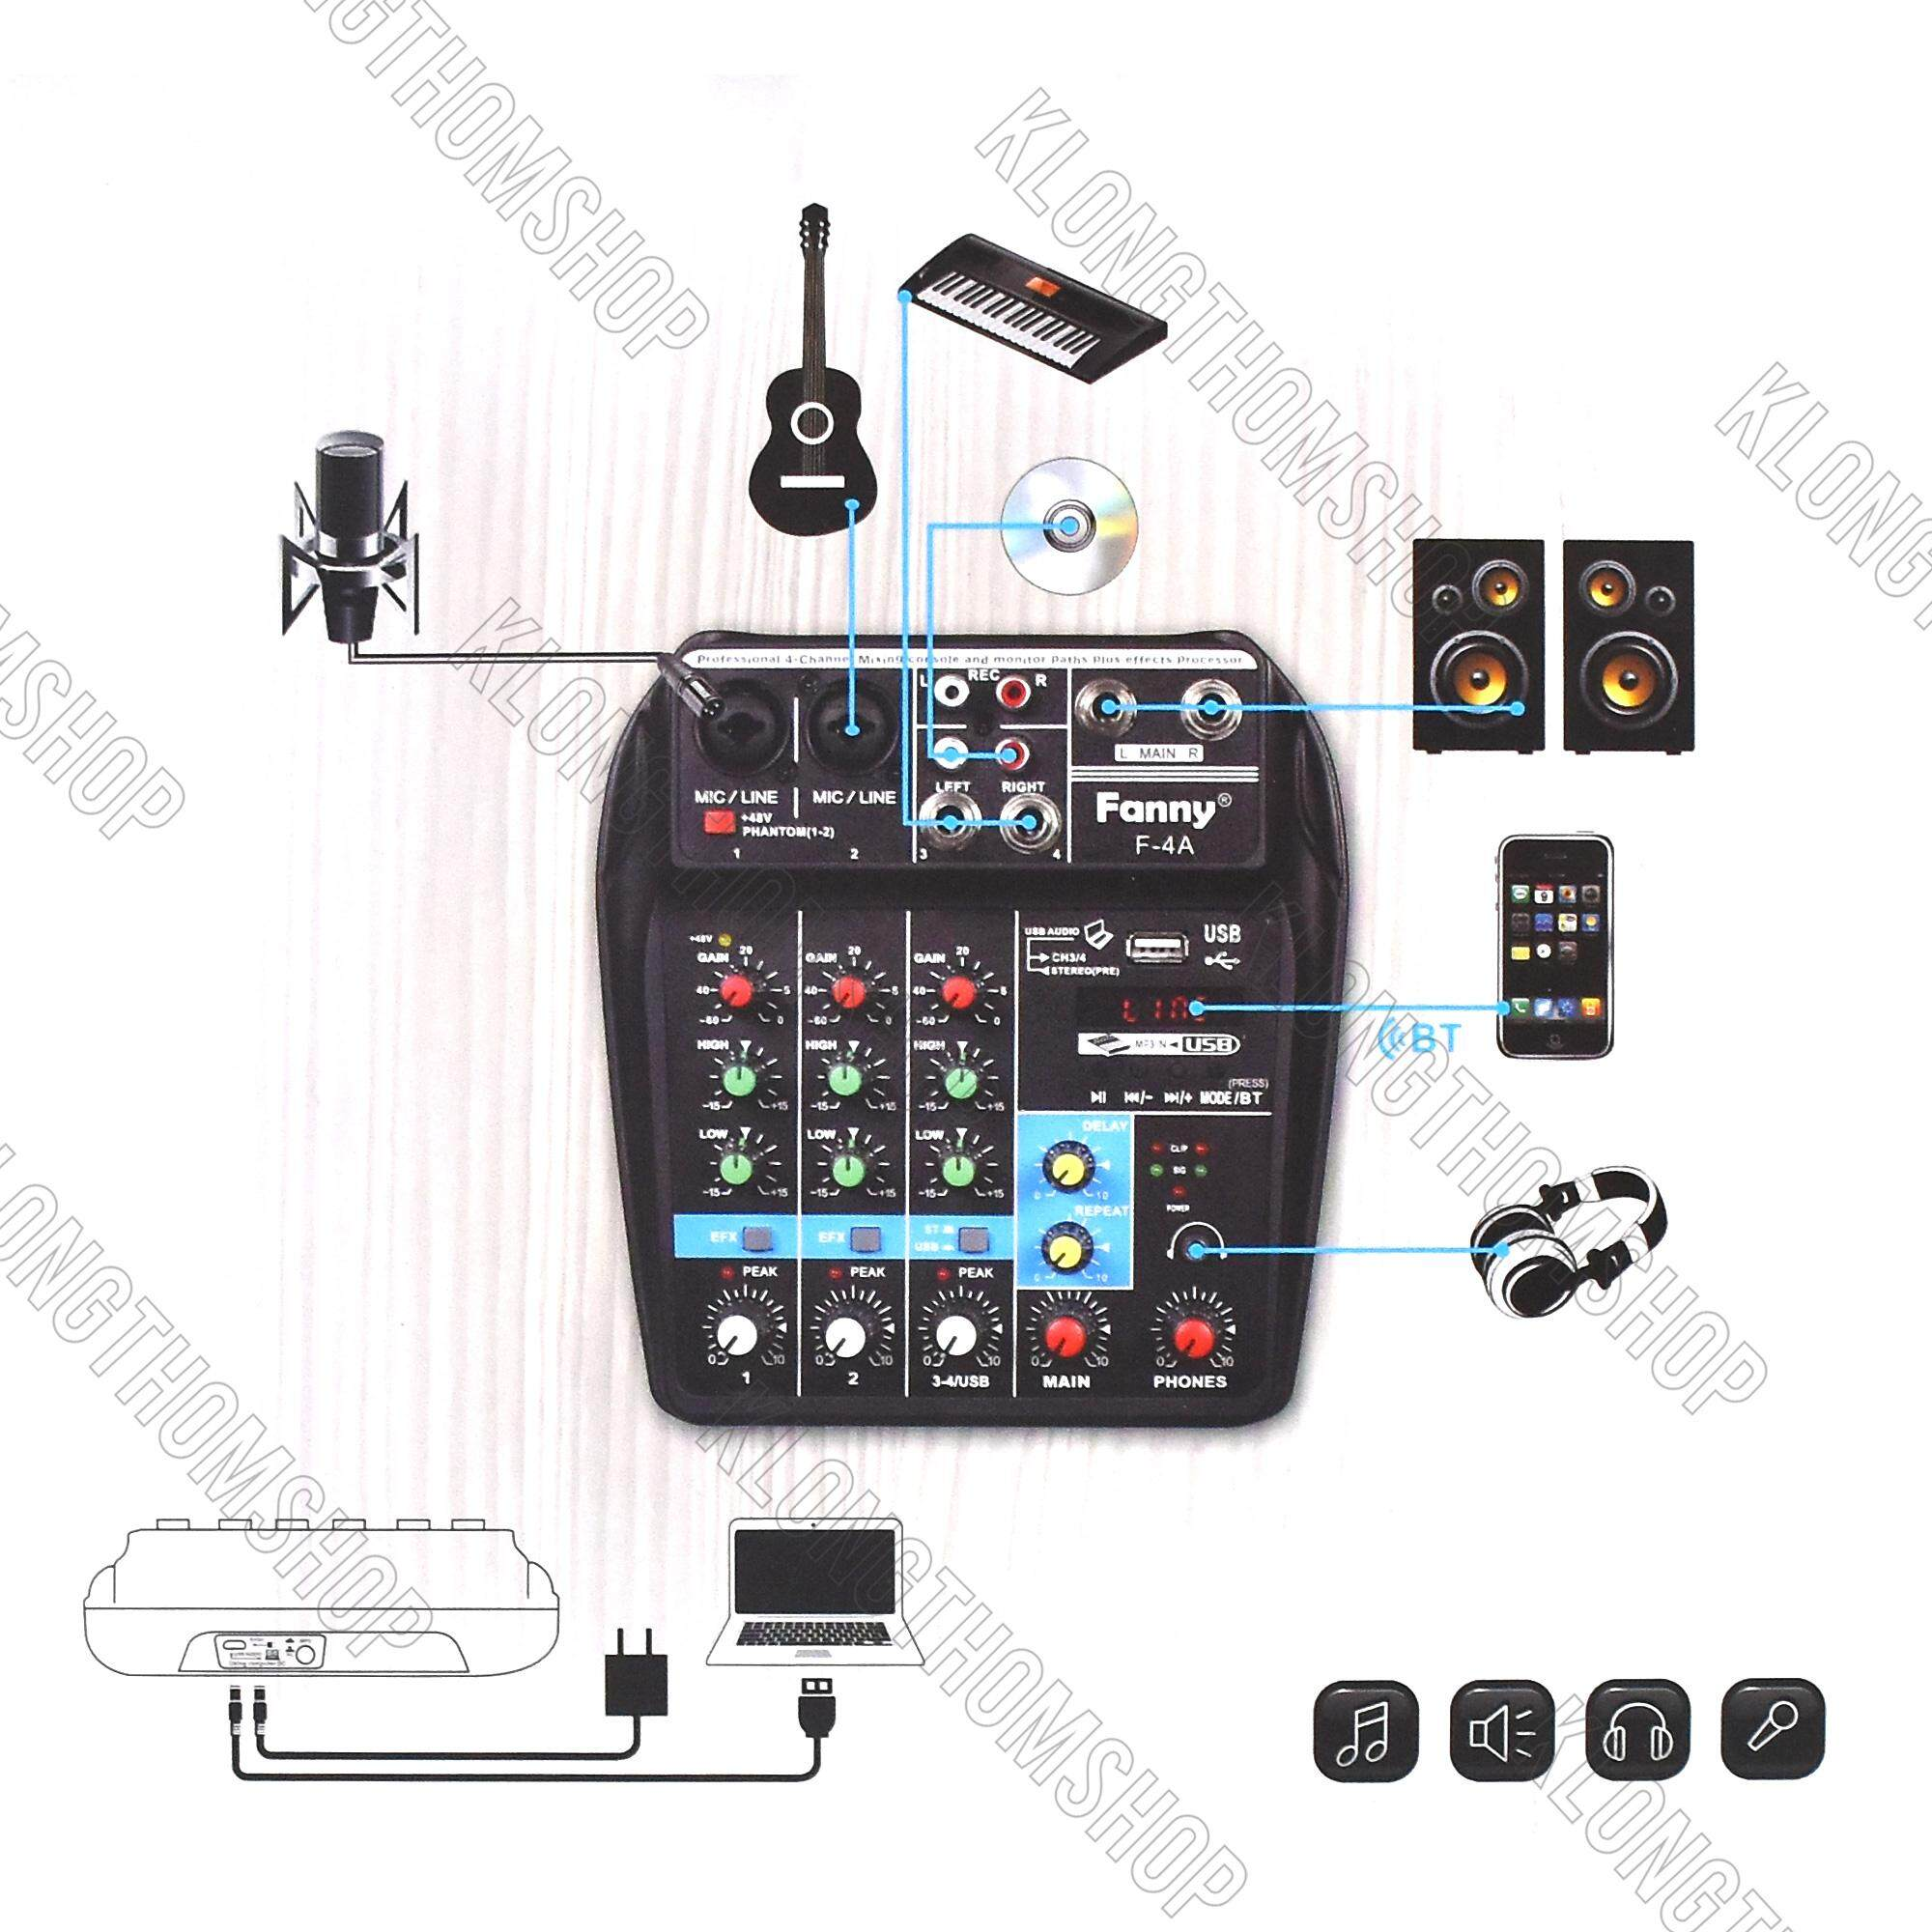 Fanny F-4a มิกซ์เซอร์ 4 แชลแนล Dj สตูดิโอ Karaoke Live สด Gaming ควบคุมซาวด์ Sound เชื่อมต่อกับคอม Pc โน๊ตบุ๊ค เป็นซาวน์ อินเตอร์เฟช Usb Sound Card Interface เครื่องเสียง ภายใน กลางแจ้ง อีเวนต์ Event งานวัด Dj  หรือ Vj เกมมิ่ง Studio.